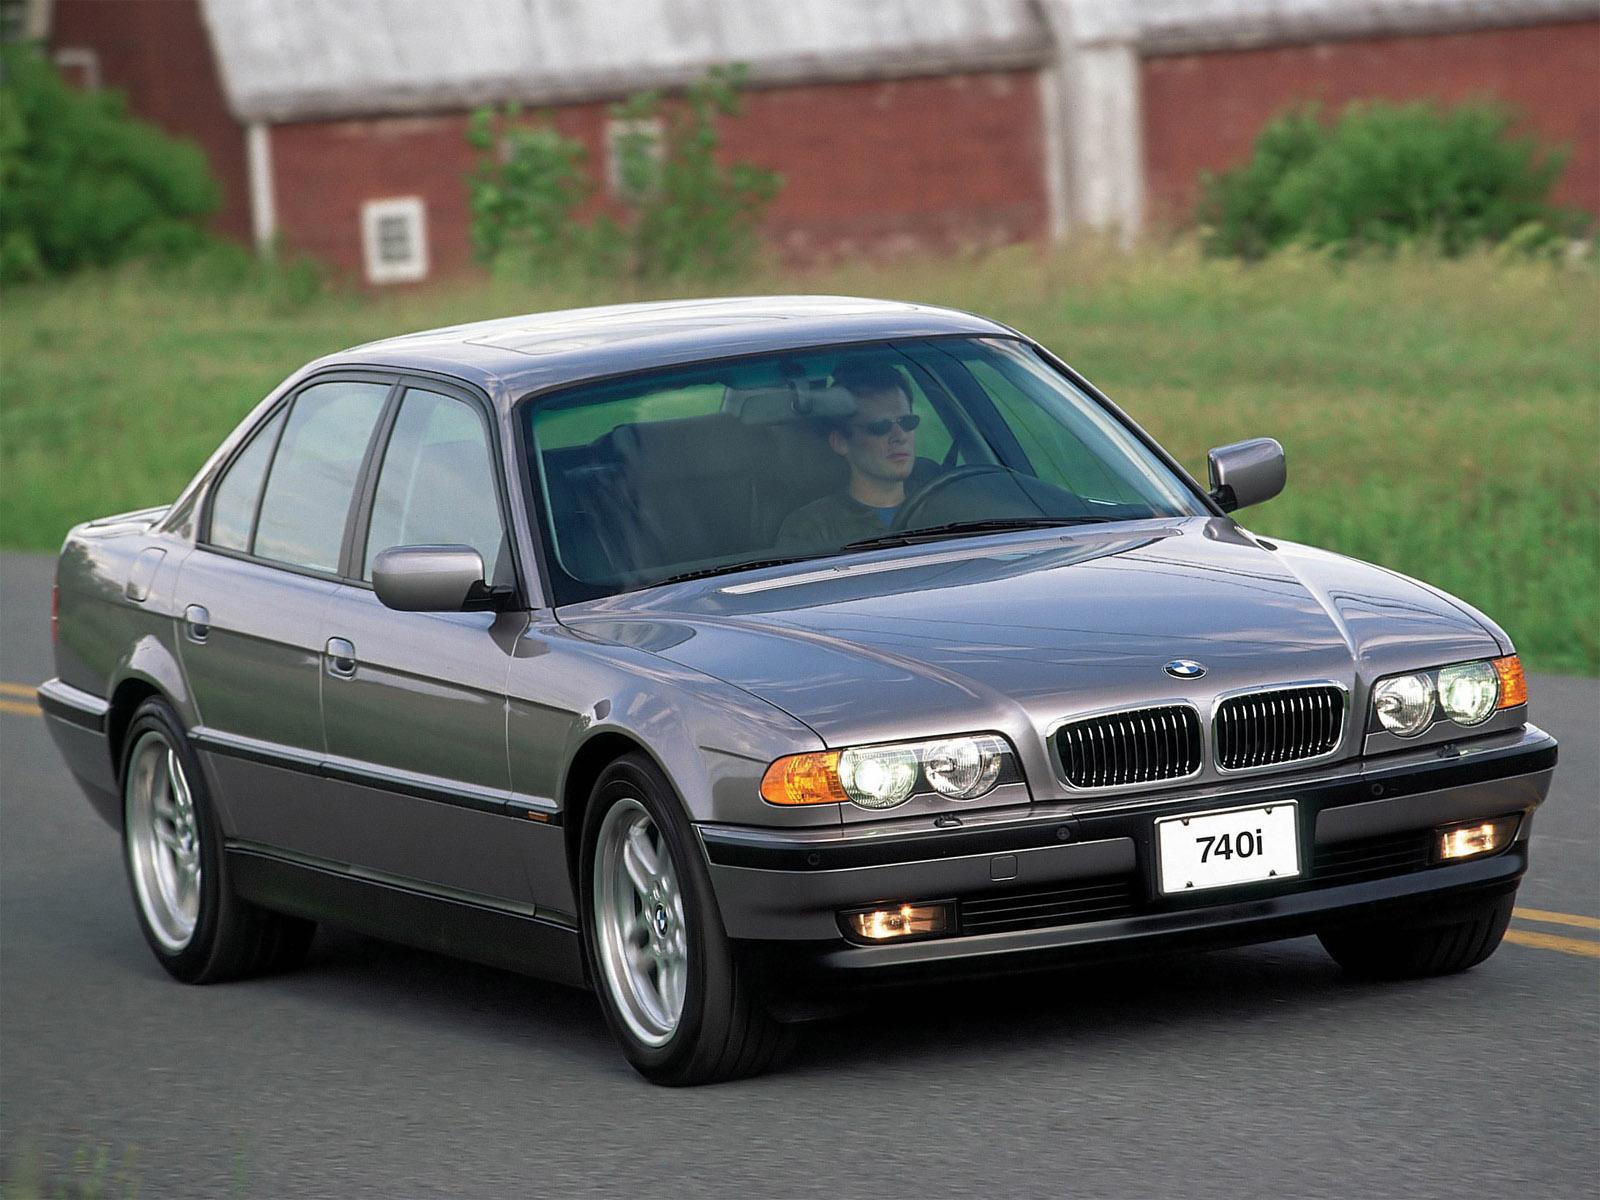 1998 BMW 740I on Bmw Wiring Diagram